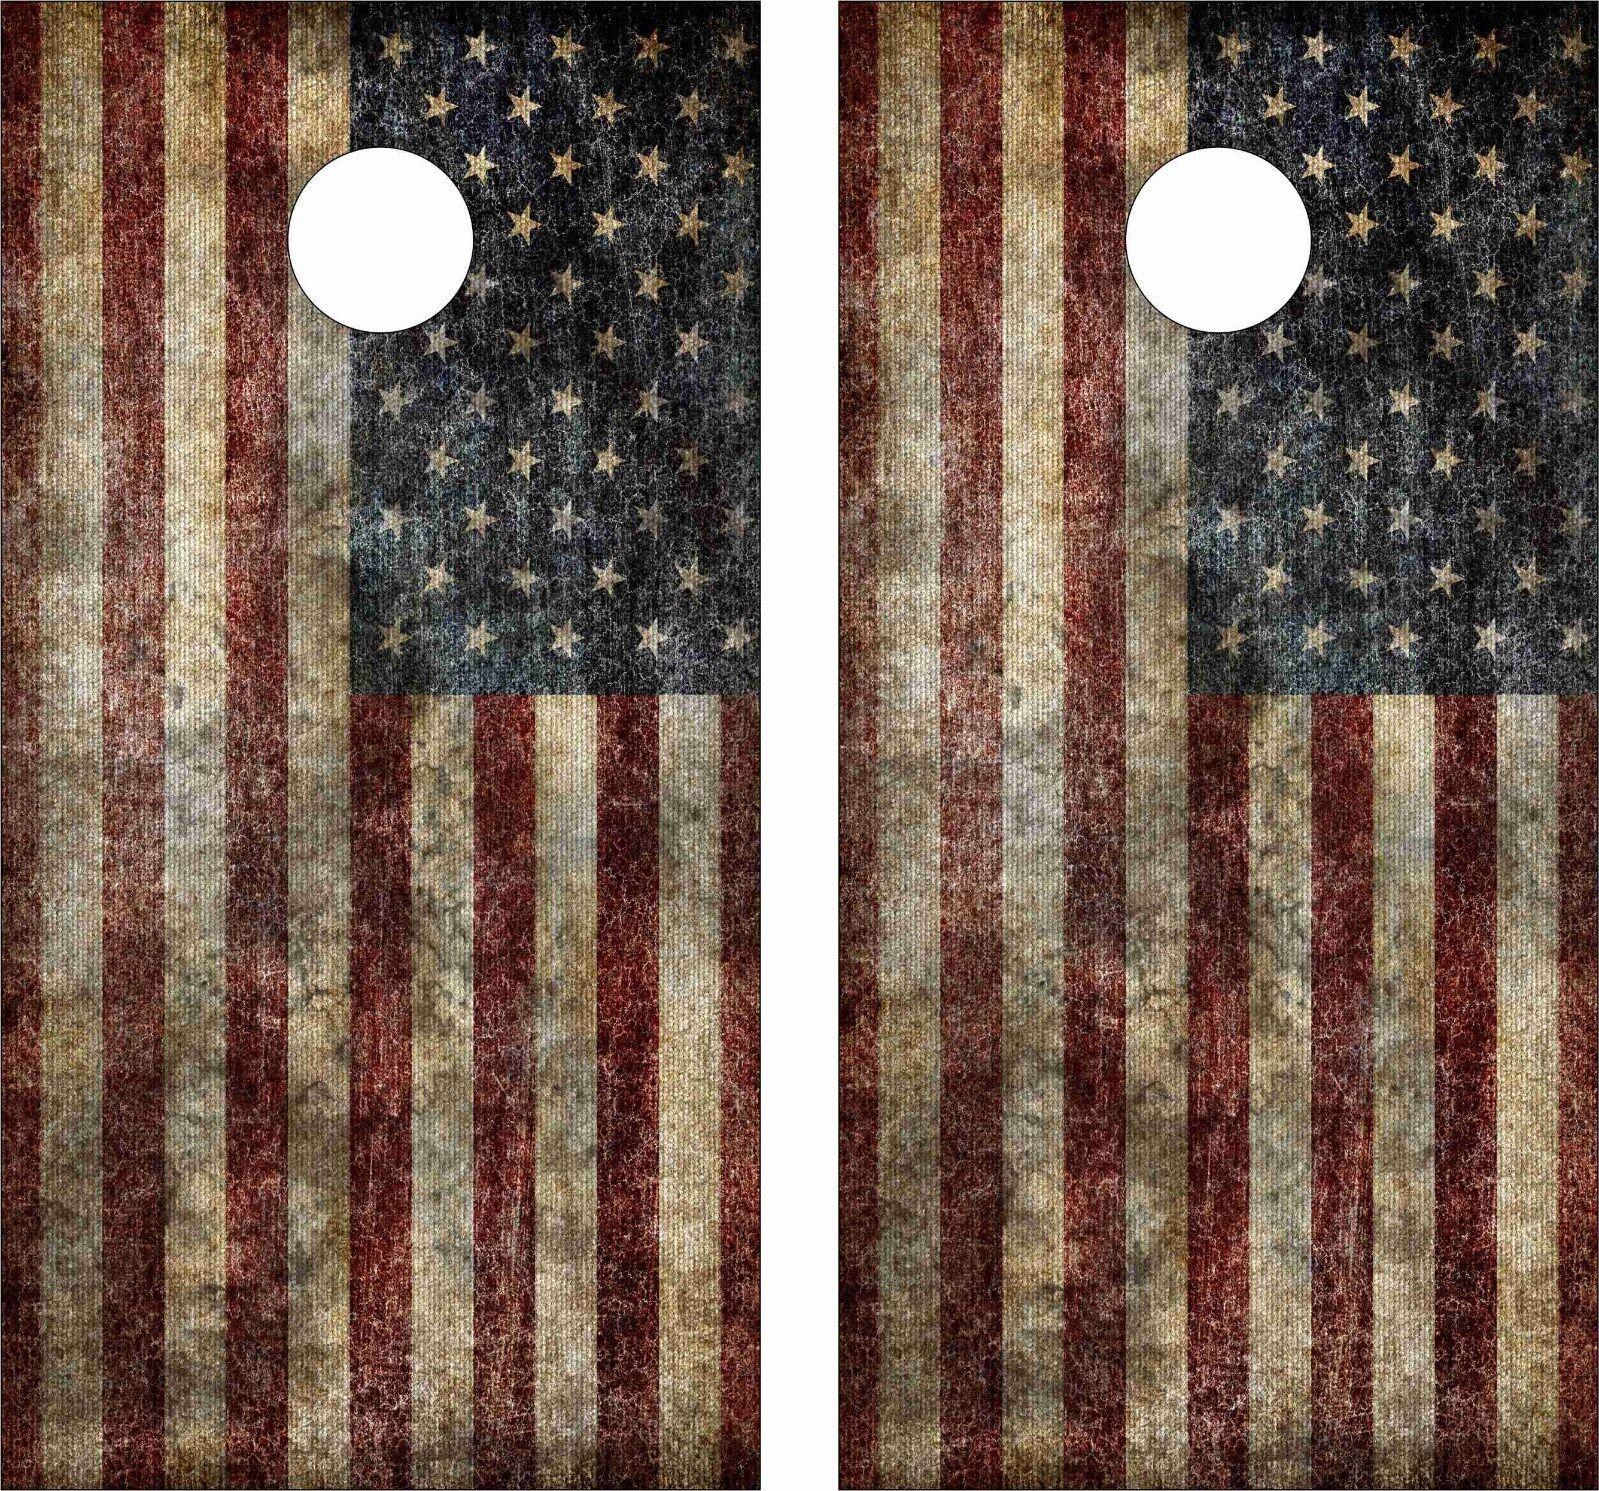 OLD AMERICAN FLAG .Cornhole Board Game Decal  Wraps USA High Quality Image bag  popular